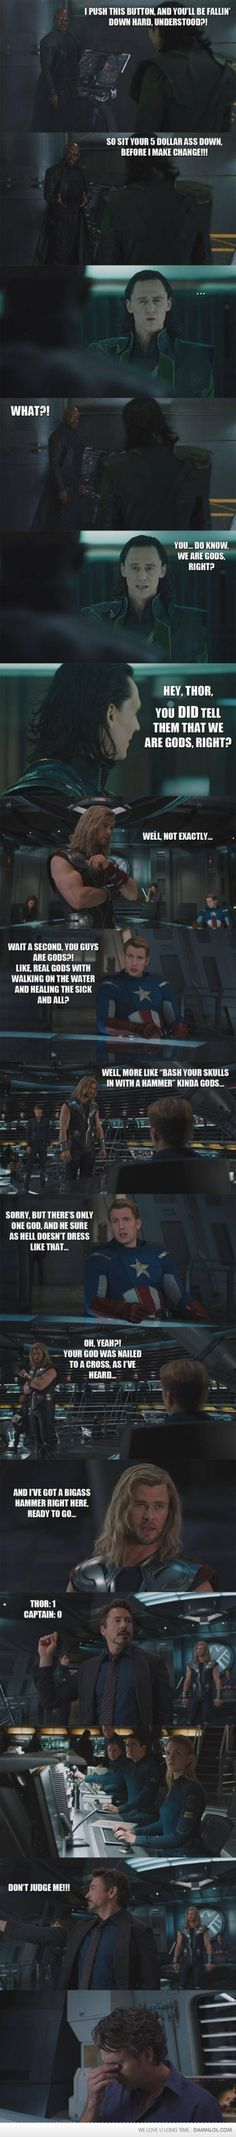 Avengers - We are gods - http://www.jokideo.com/